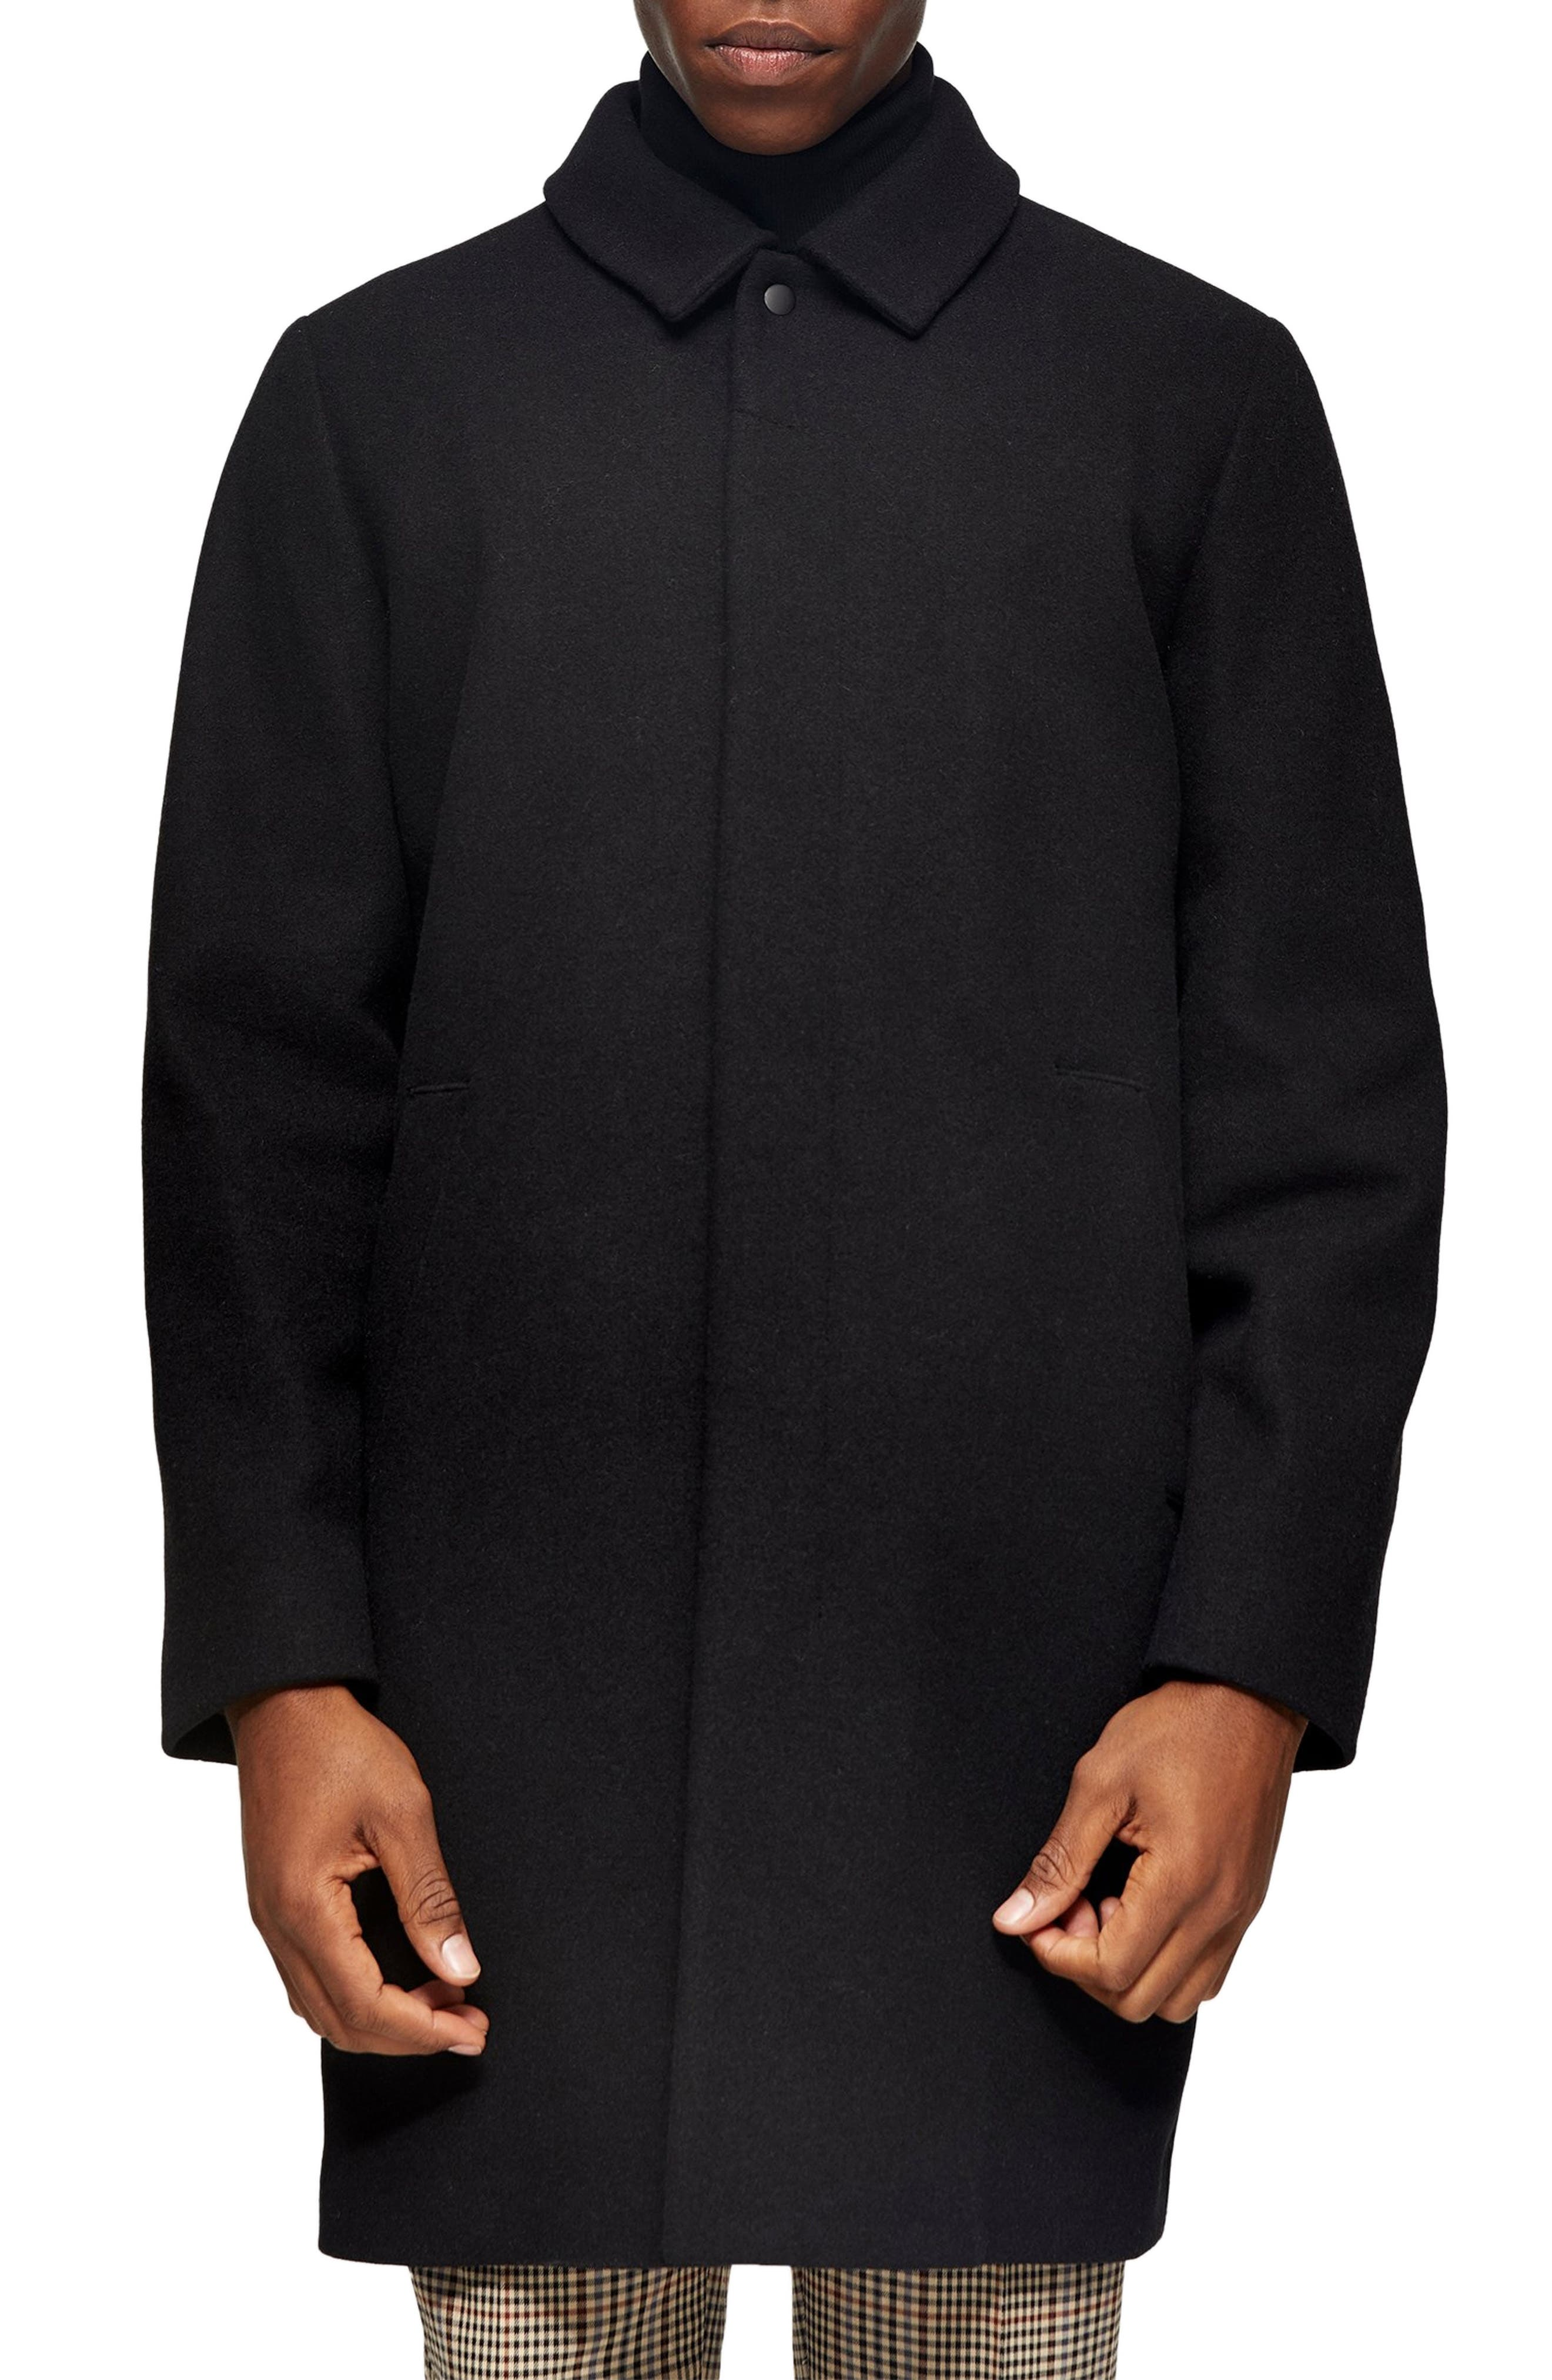 50s Men's Jackets | Greaser Jackets, Leather, Bomber, Gabardine Mens Topman Ryan Classic Fit Overcoat Size X-Large - Black $170.00 AT vintagedancer.com